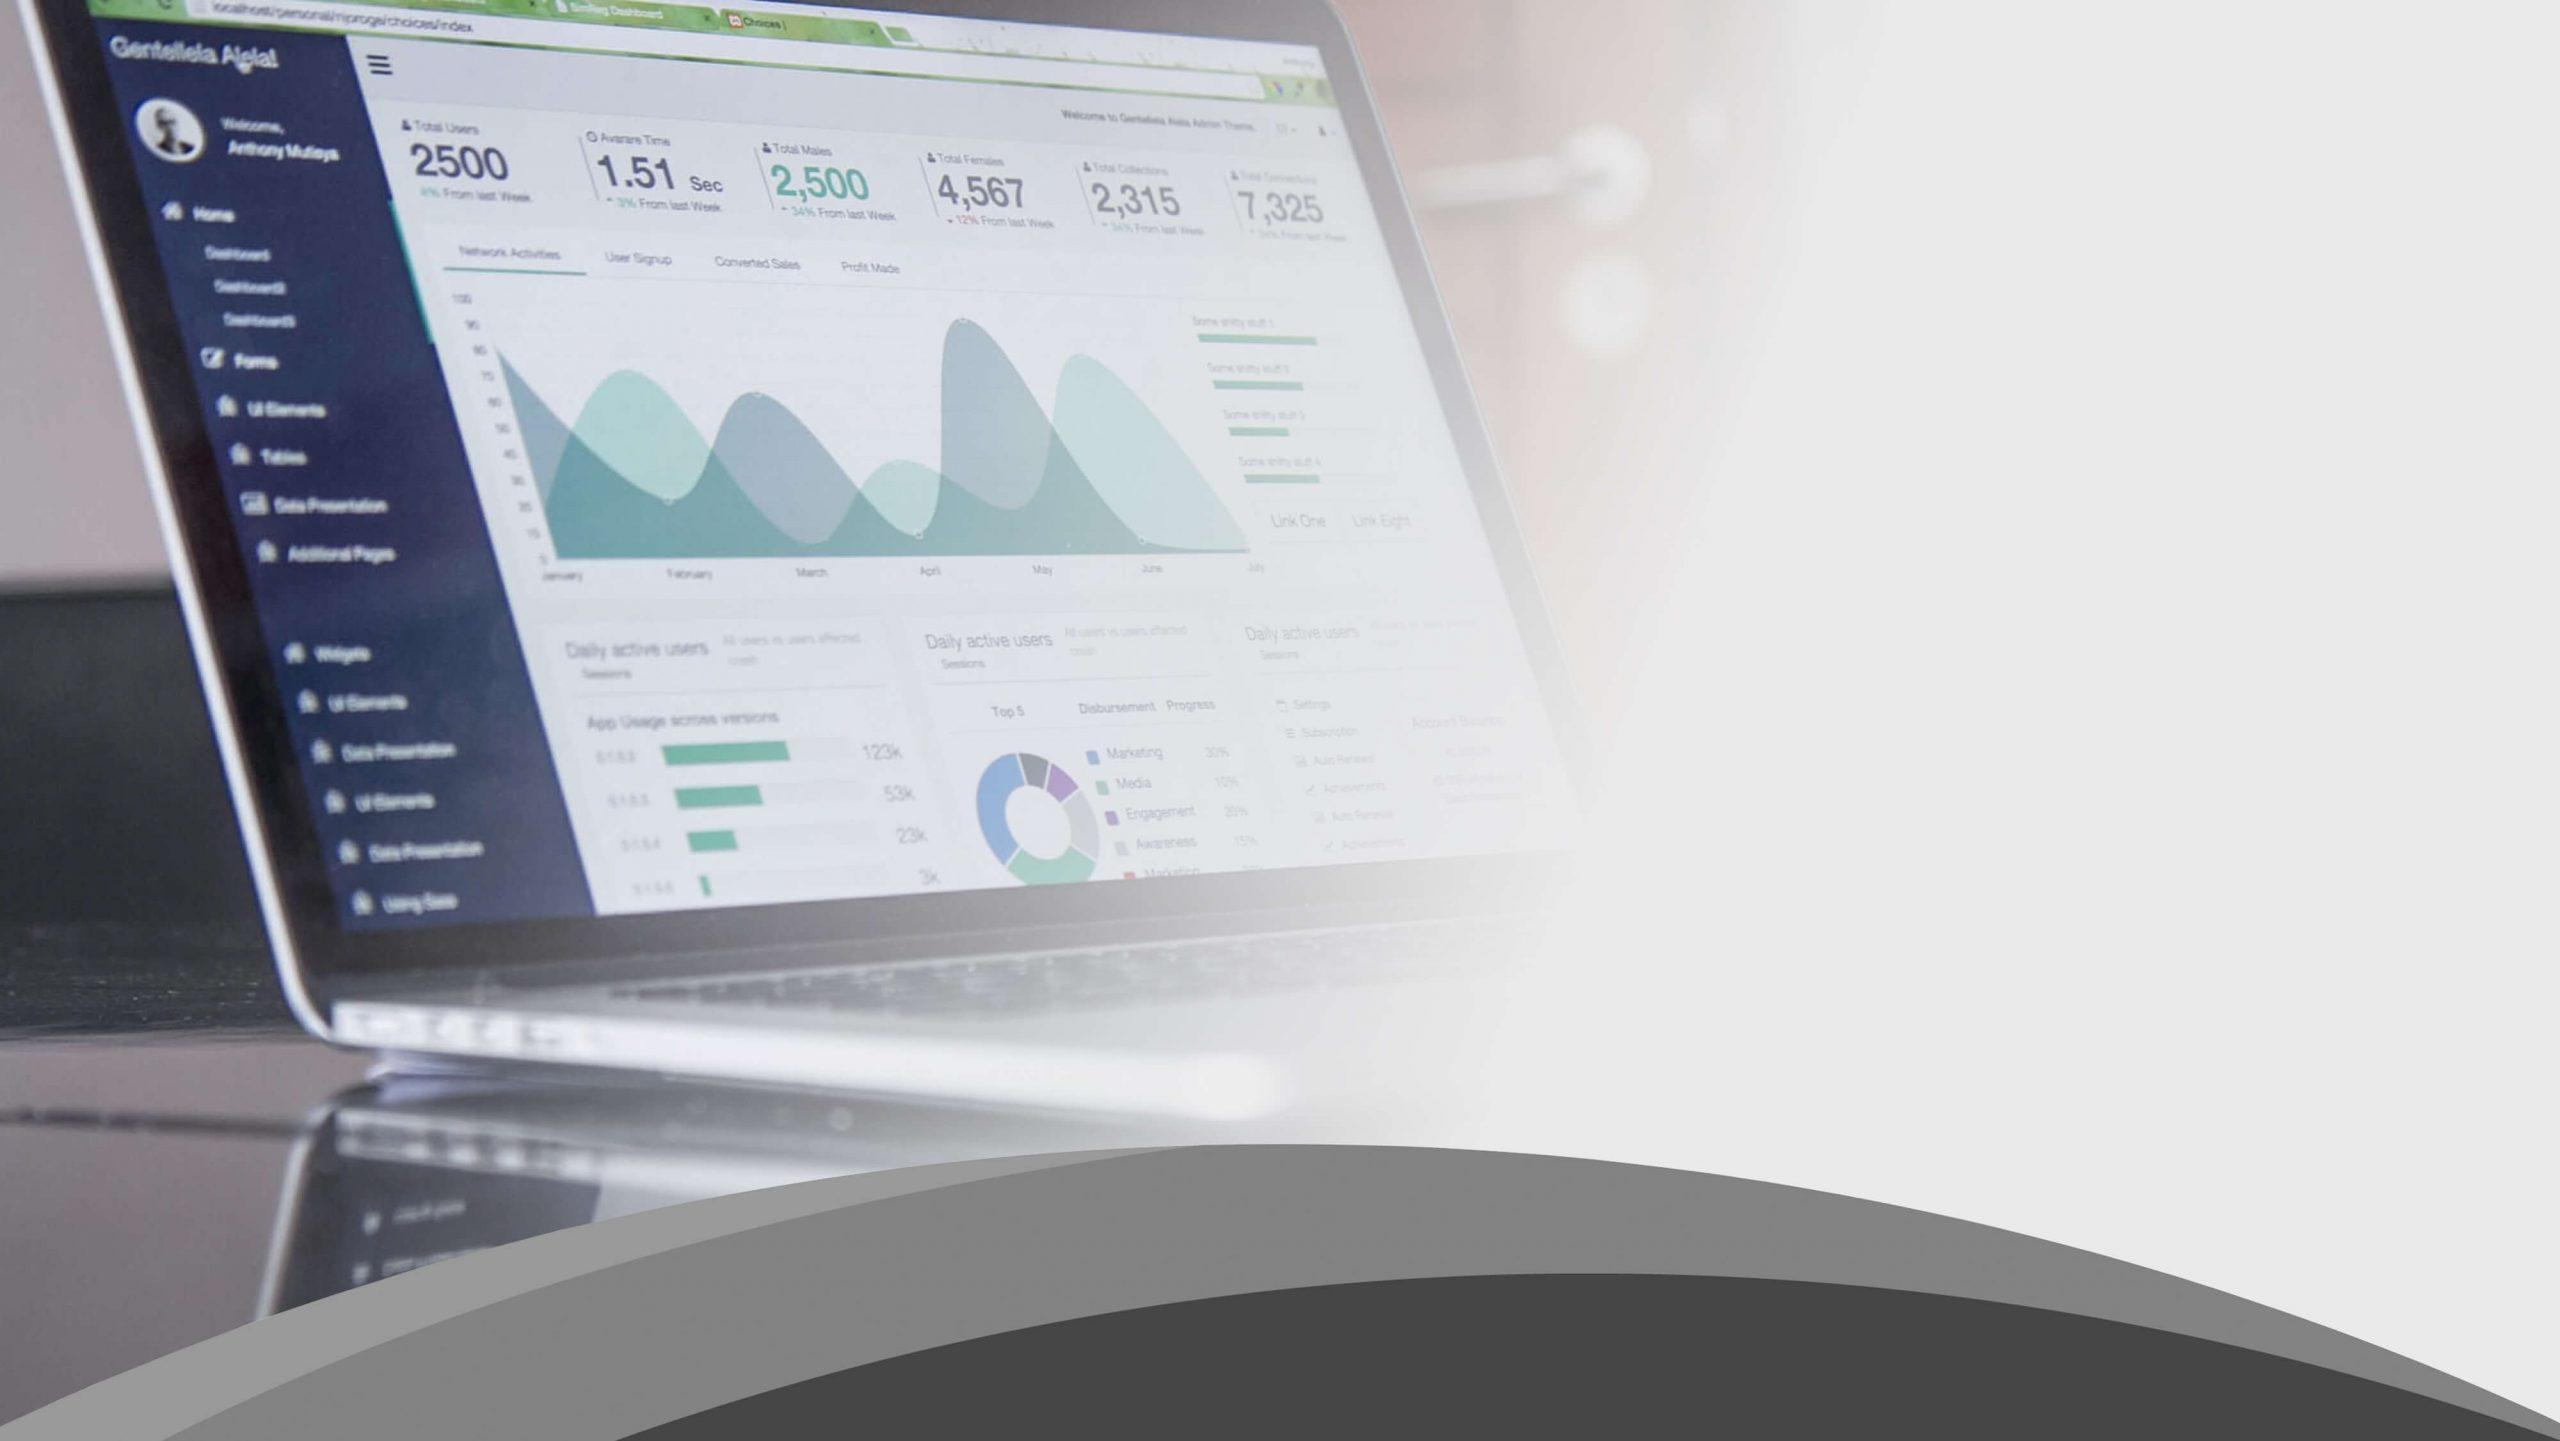 Ottawa Accounting, Finance & Payroll Salary Guide 2020